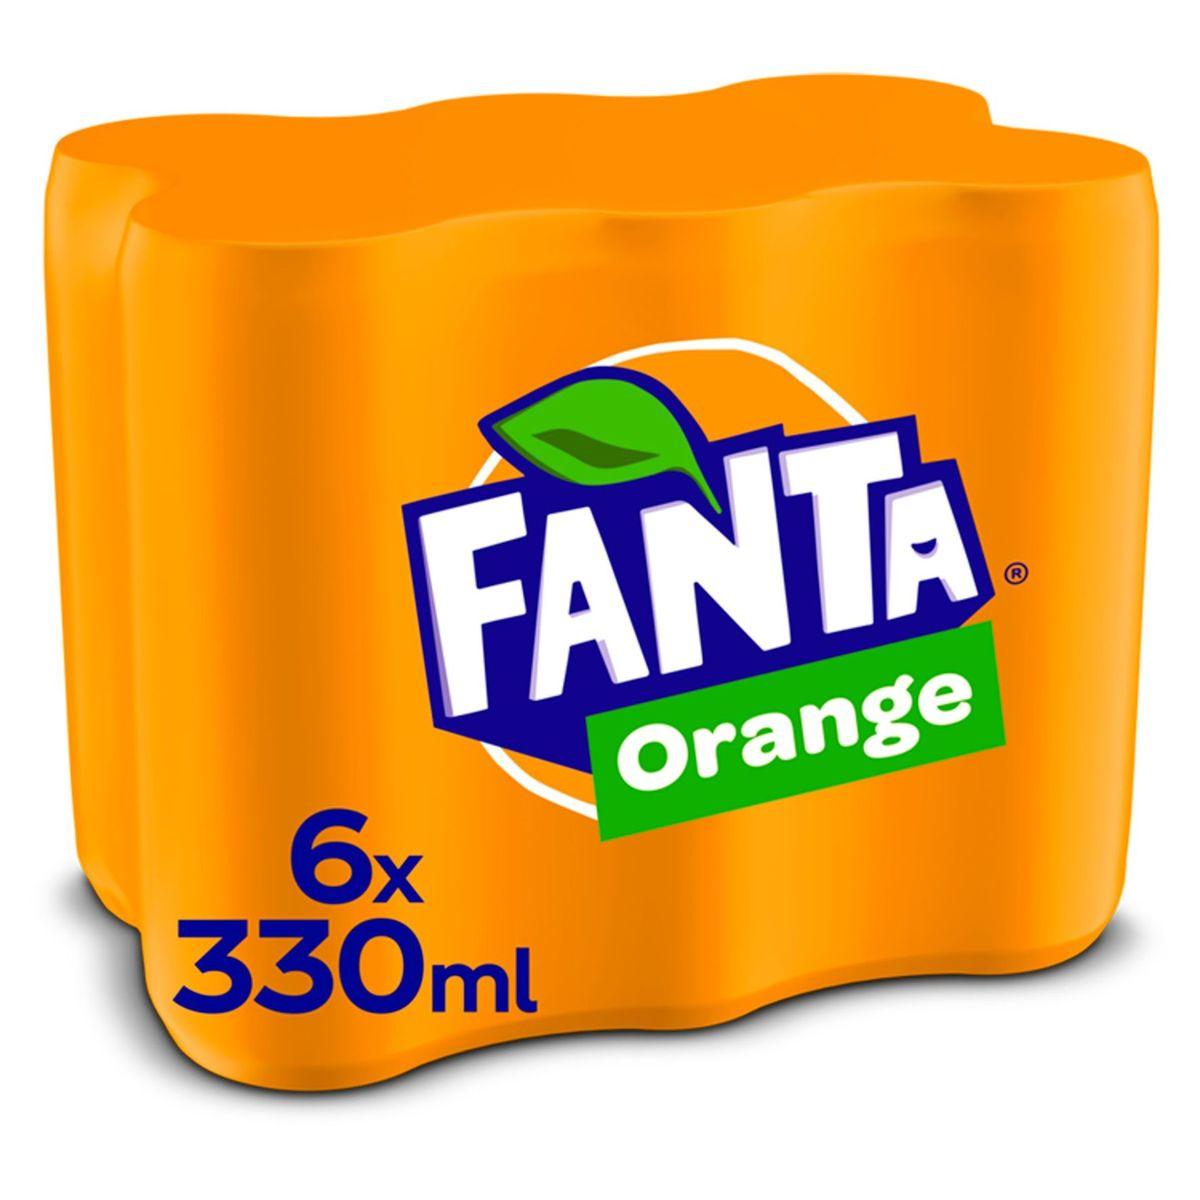 Fanta Orange Canette 6 x 330 ml